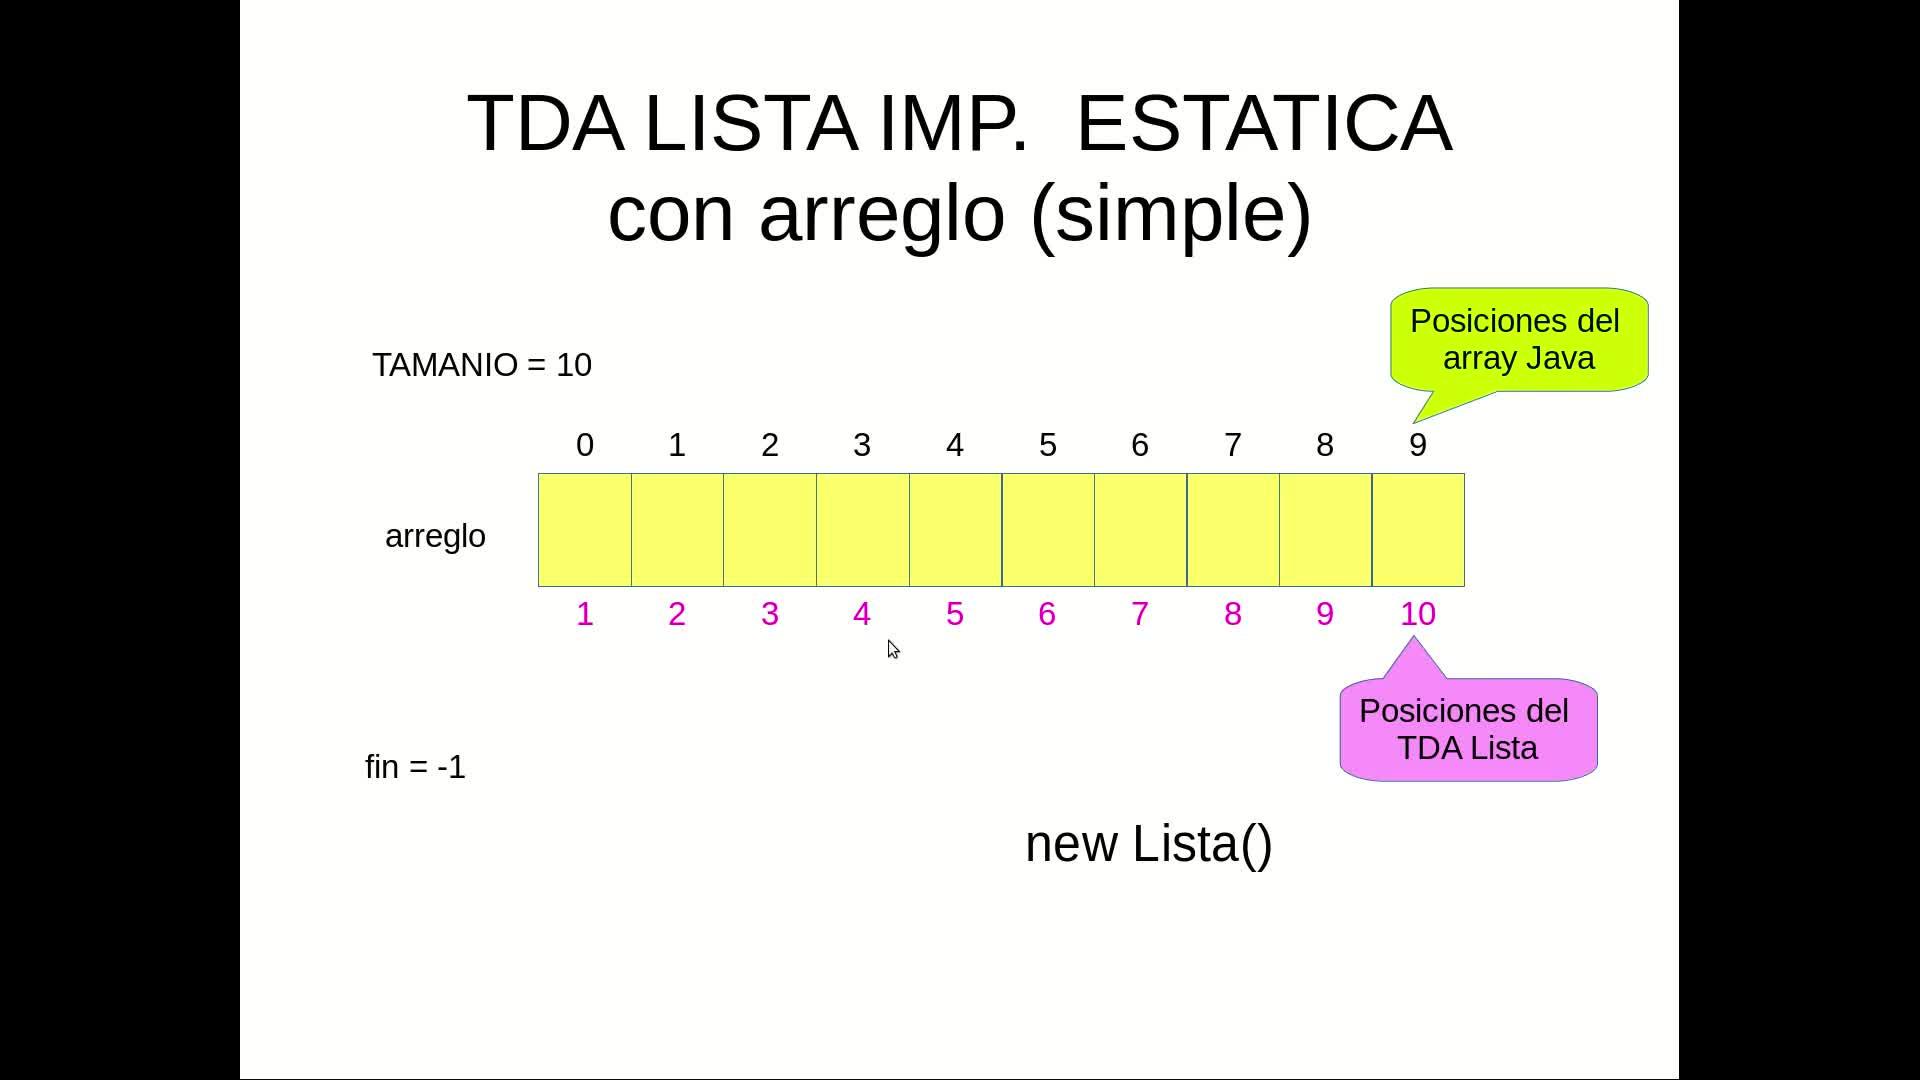 EDAT - Video 2.5 - TDA Lista (Implementación dinamica) - Parte I